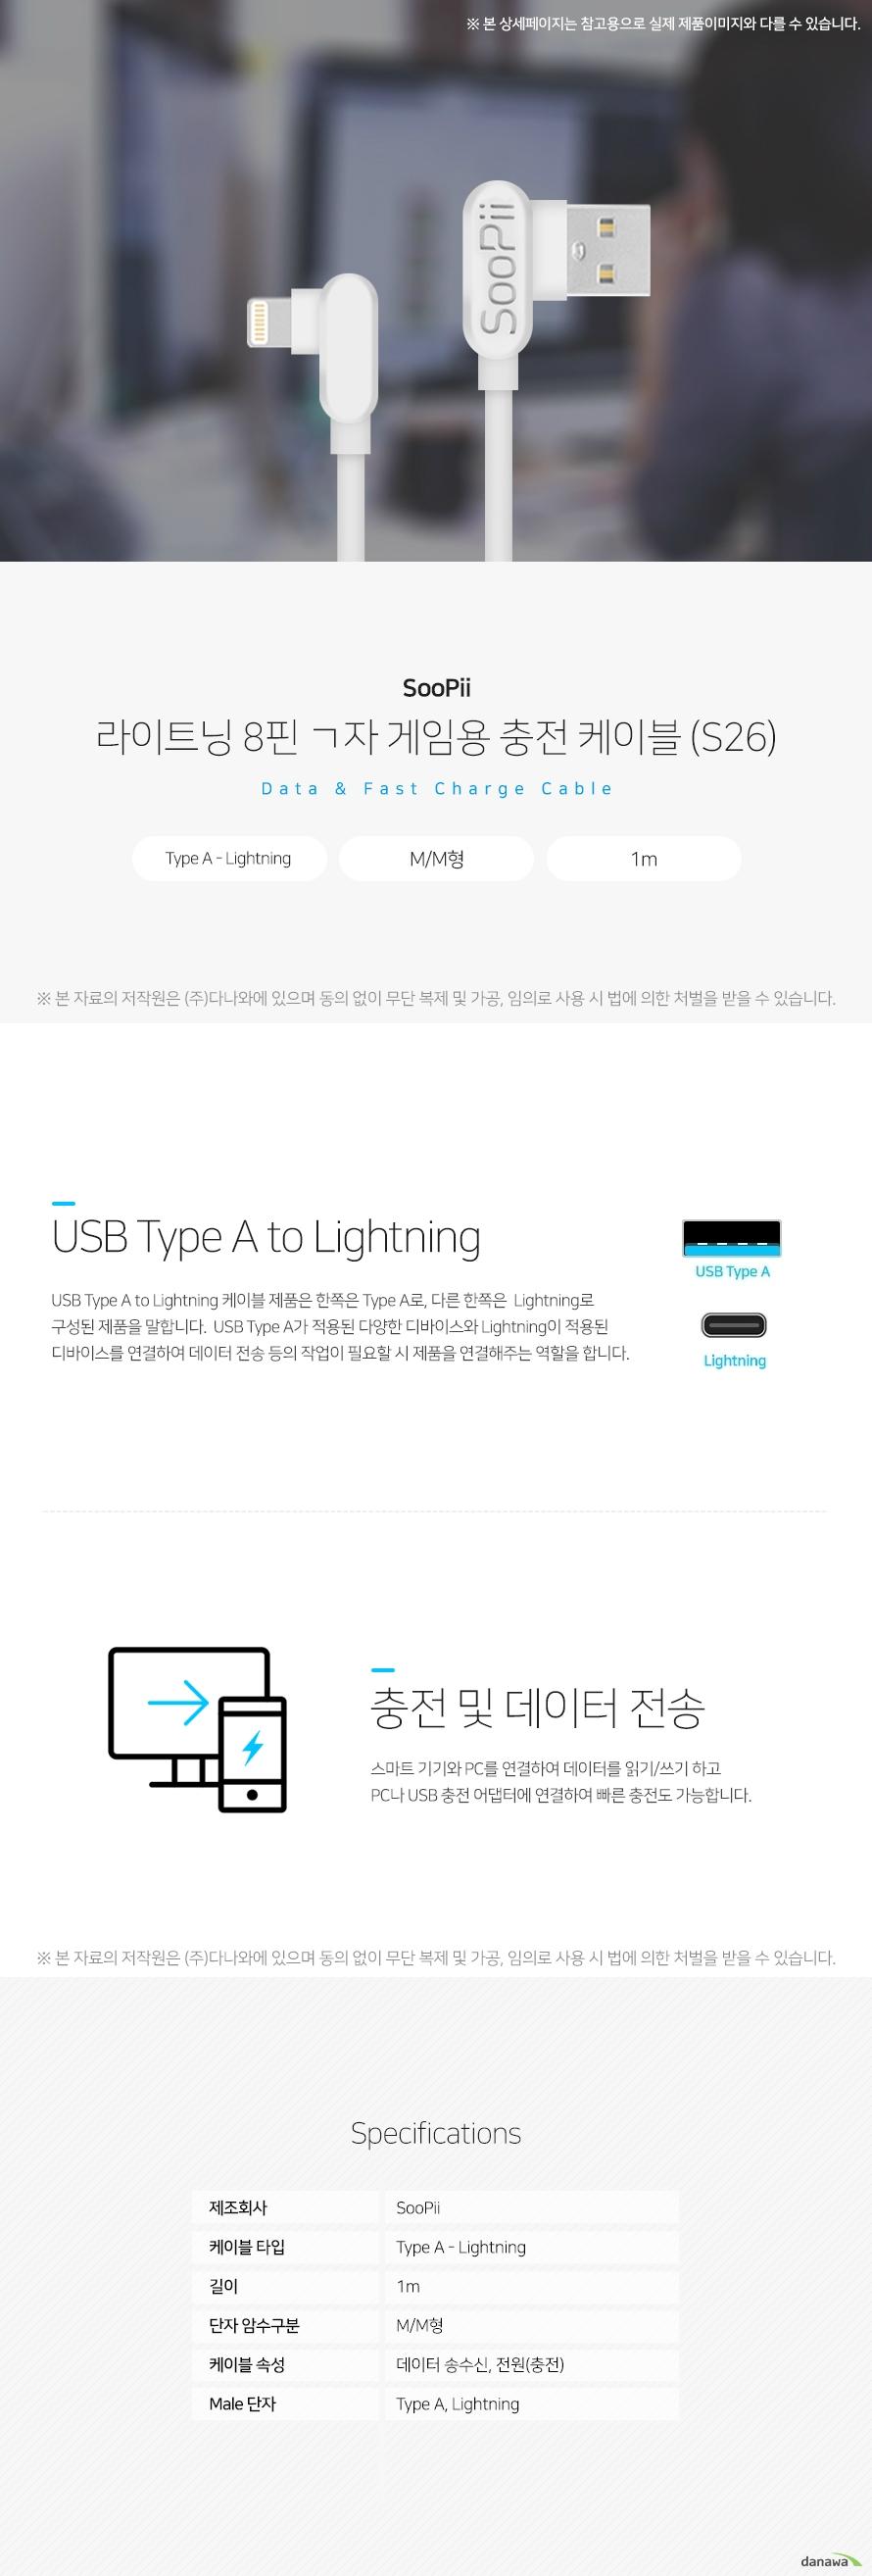 SooPii 라이트닝 8핀 ㄱ자 게임용 충전 케이블 (S26) USB Type A to Lightning USB Type A to Lightning 케이블 제품은 한쪽은 Type A로, 다른   한쪽은  Lightning로 구성된 제품을 말합니다.  USB Type A가 적  용된 다양한 디바이스와 Lightning이 적용된 디바이스를 연결하  여 데이터 전송 등의 작업이 필요할 시 제품을 연결해주는 역할  을 합니다.  충전 및 데이터 전송 스마트 기기와 PC를 연결하여 데이터를 읽기/쓰기 하고 PC나 USB   충전 어댑터에 연결하여 빠른 충전도 가능합니다. 스펙 제조회사 SooPii 케이블 타입 Type A - Lightning 길이 1m 단자 암수구분 M/M형 케이블 속성 데이터 송수신, 전원(충전) Male 단자 Type A, Lightning